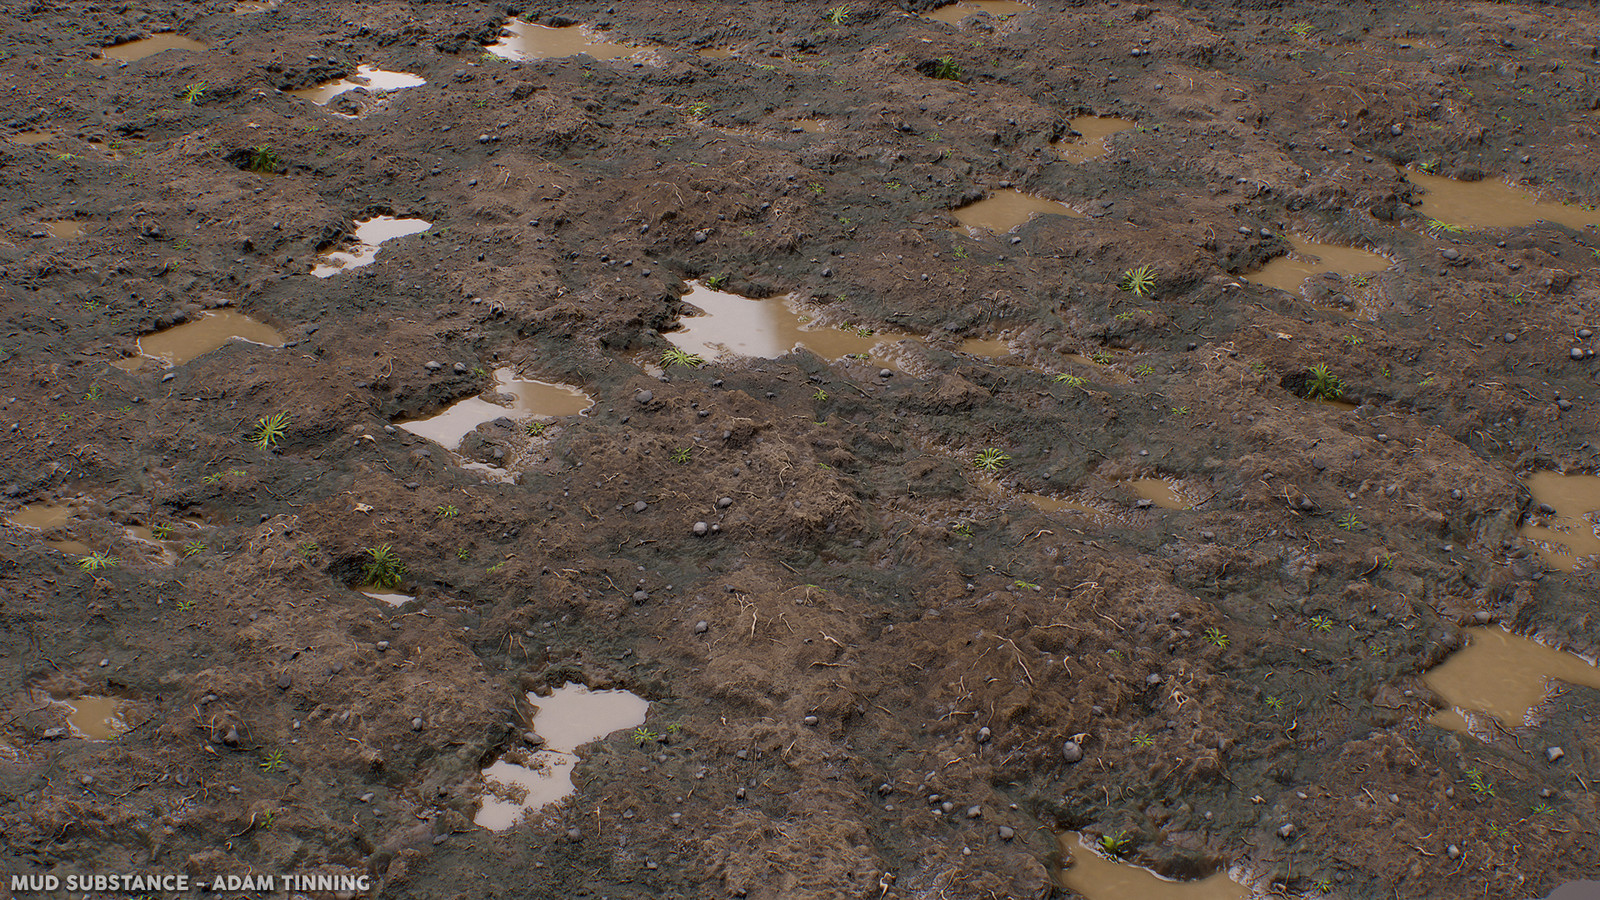 Mud Substance